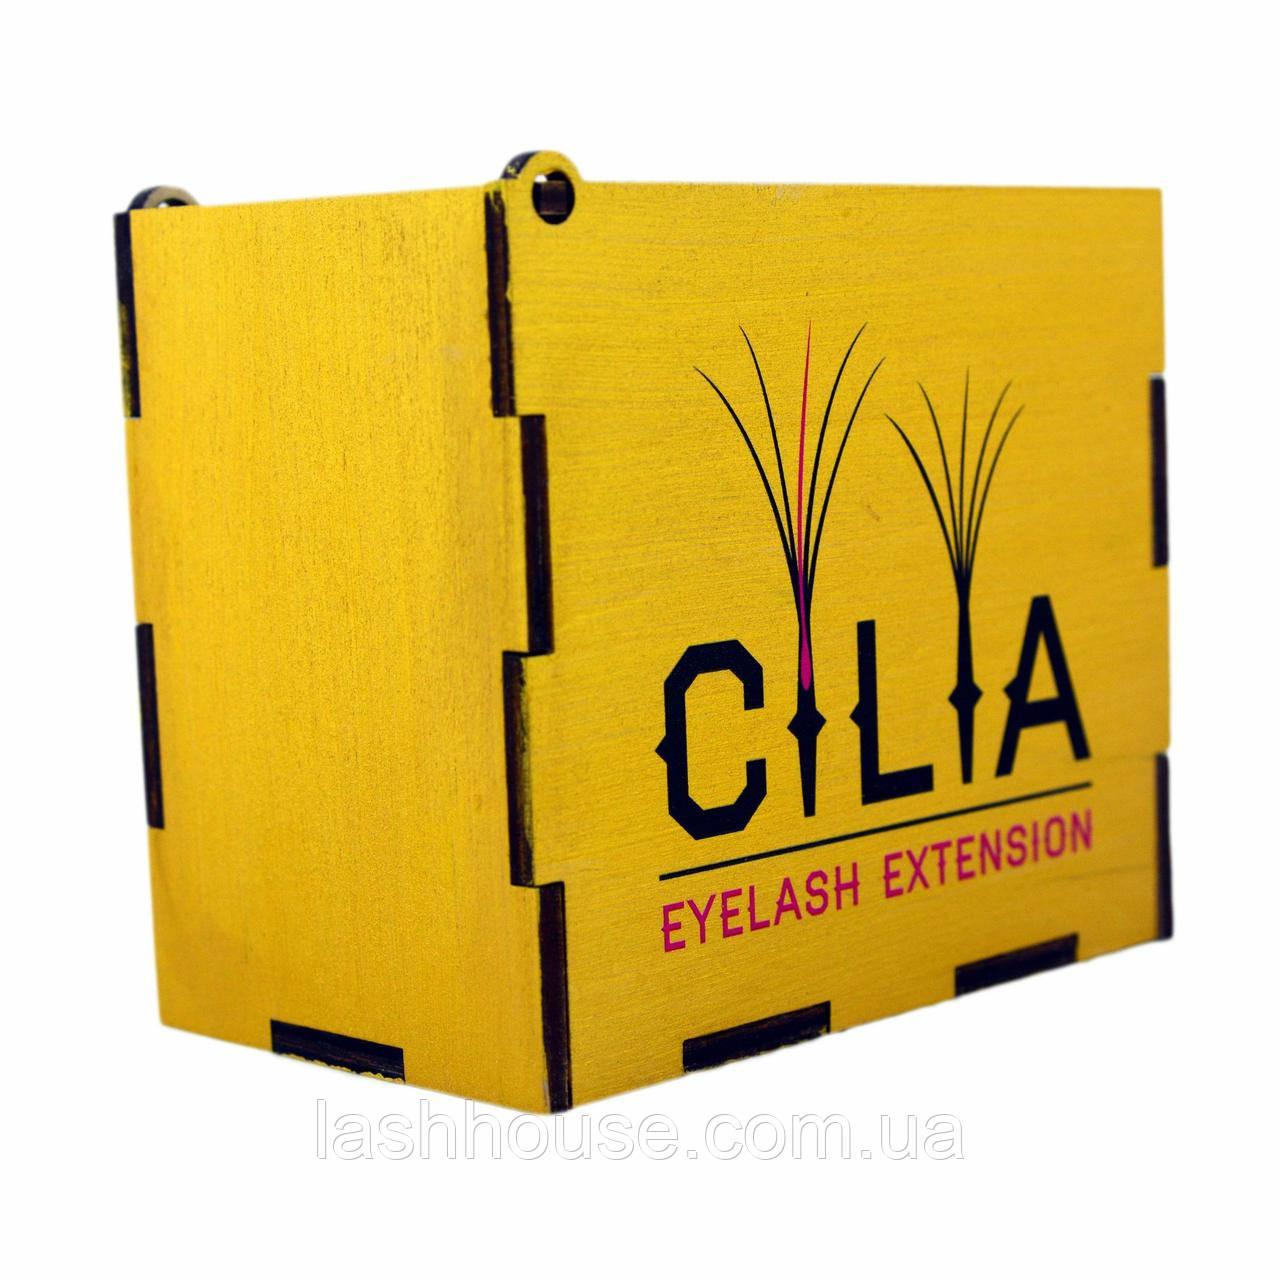 LashBox Для Ресниц Cilia [GOLD] (Лэшбокс С 5 Планшетками)